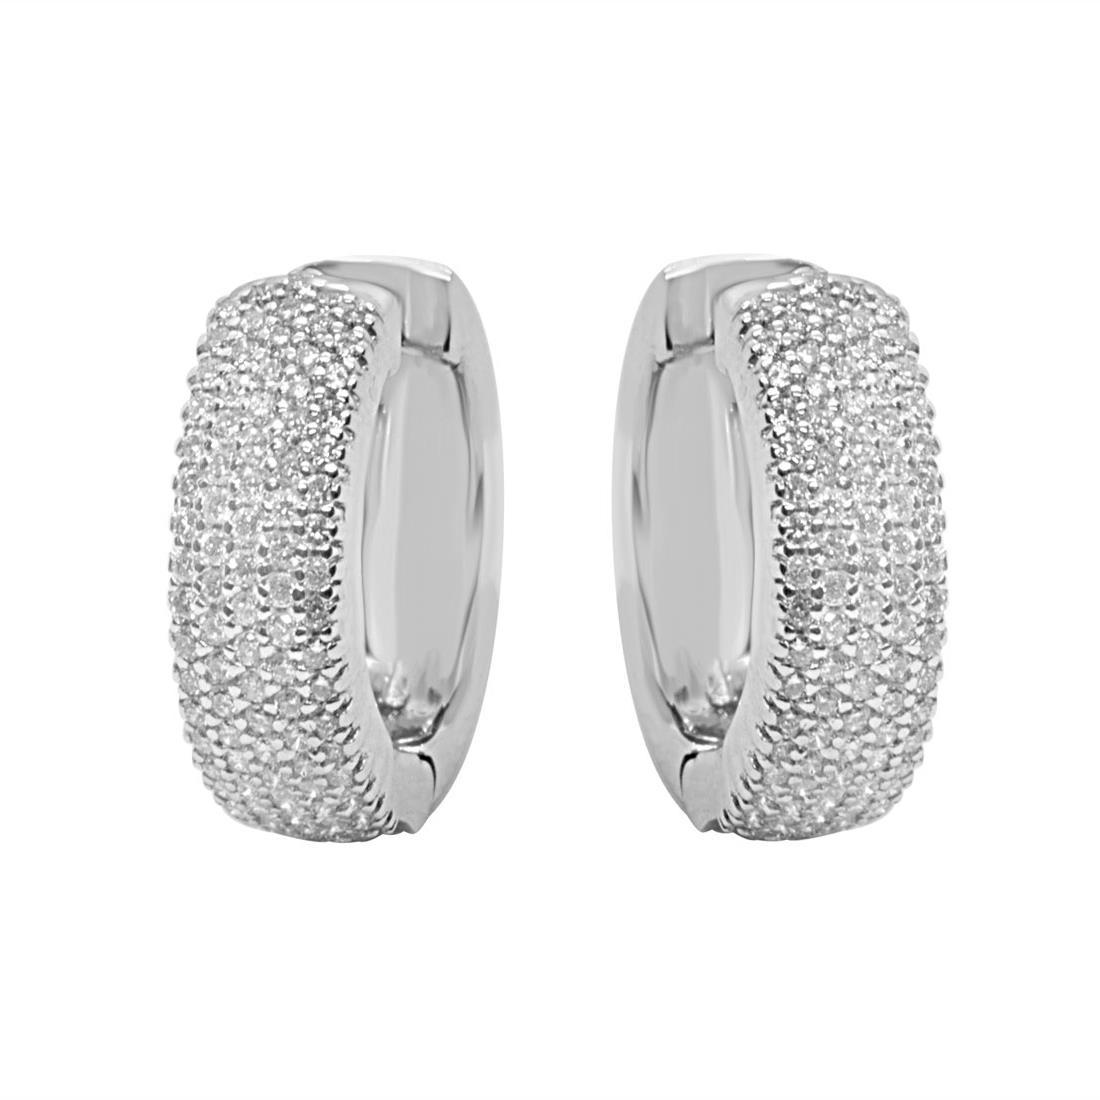 Orecchini Alfieri & St John con diamanti ct 0.69 - ALFIERI ST JOHN